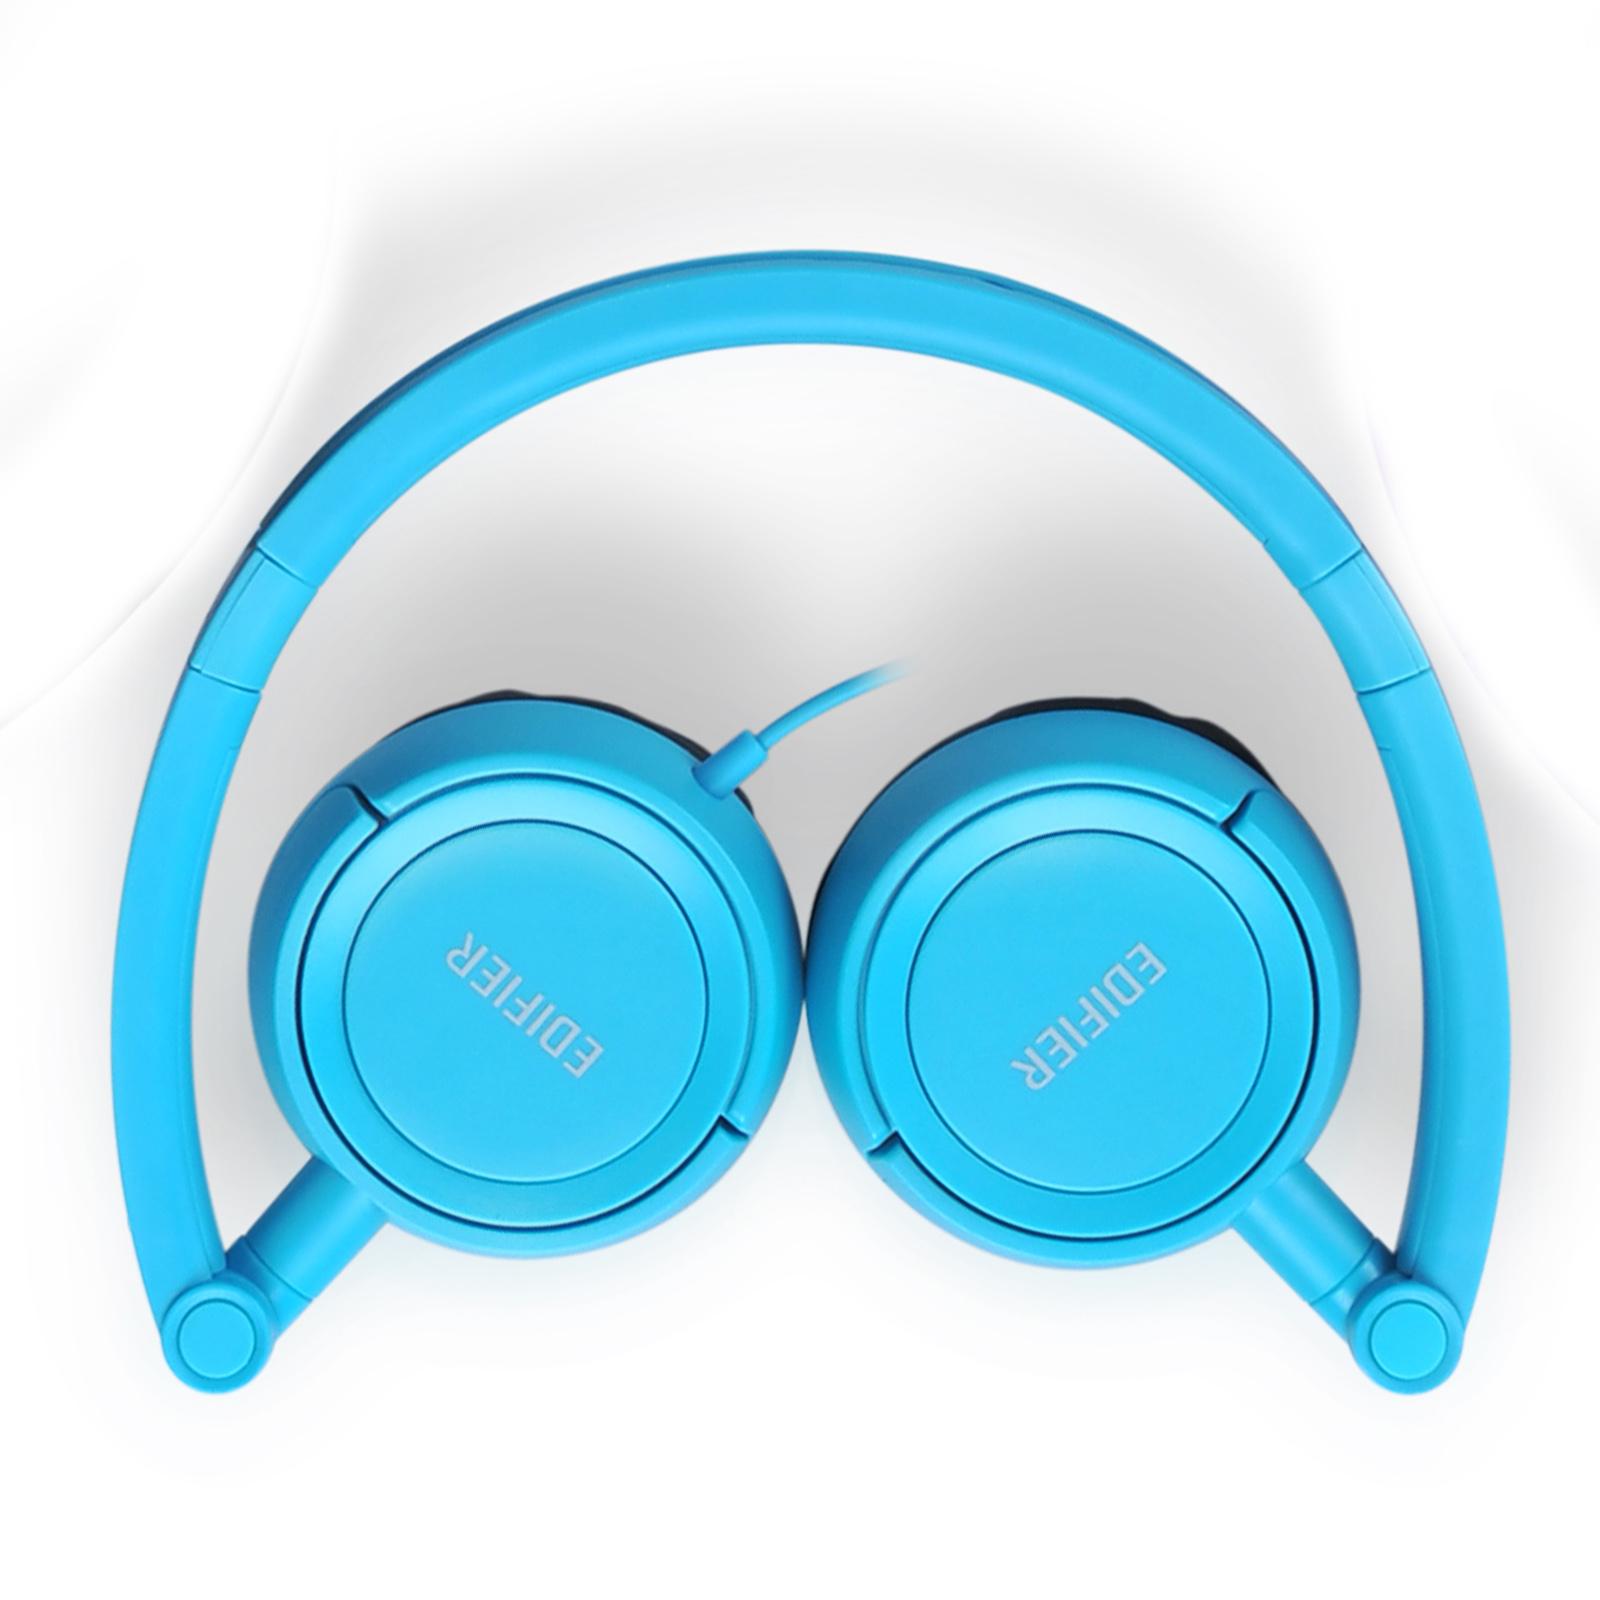 Edifier H650 Headphones - Hi-Fi On-Ear Foldable Noise-Isolating Stereo Headphone, Ultralight and Tri-fold Portable - Blue - image 5 of 7